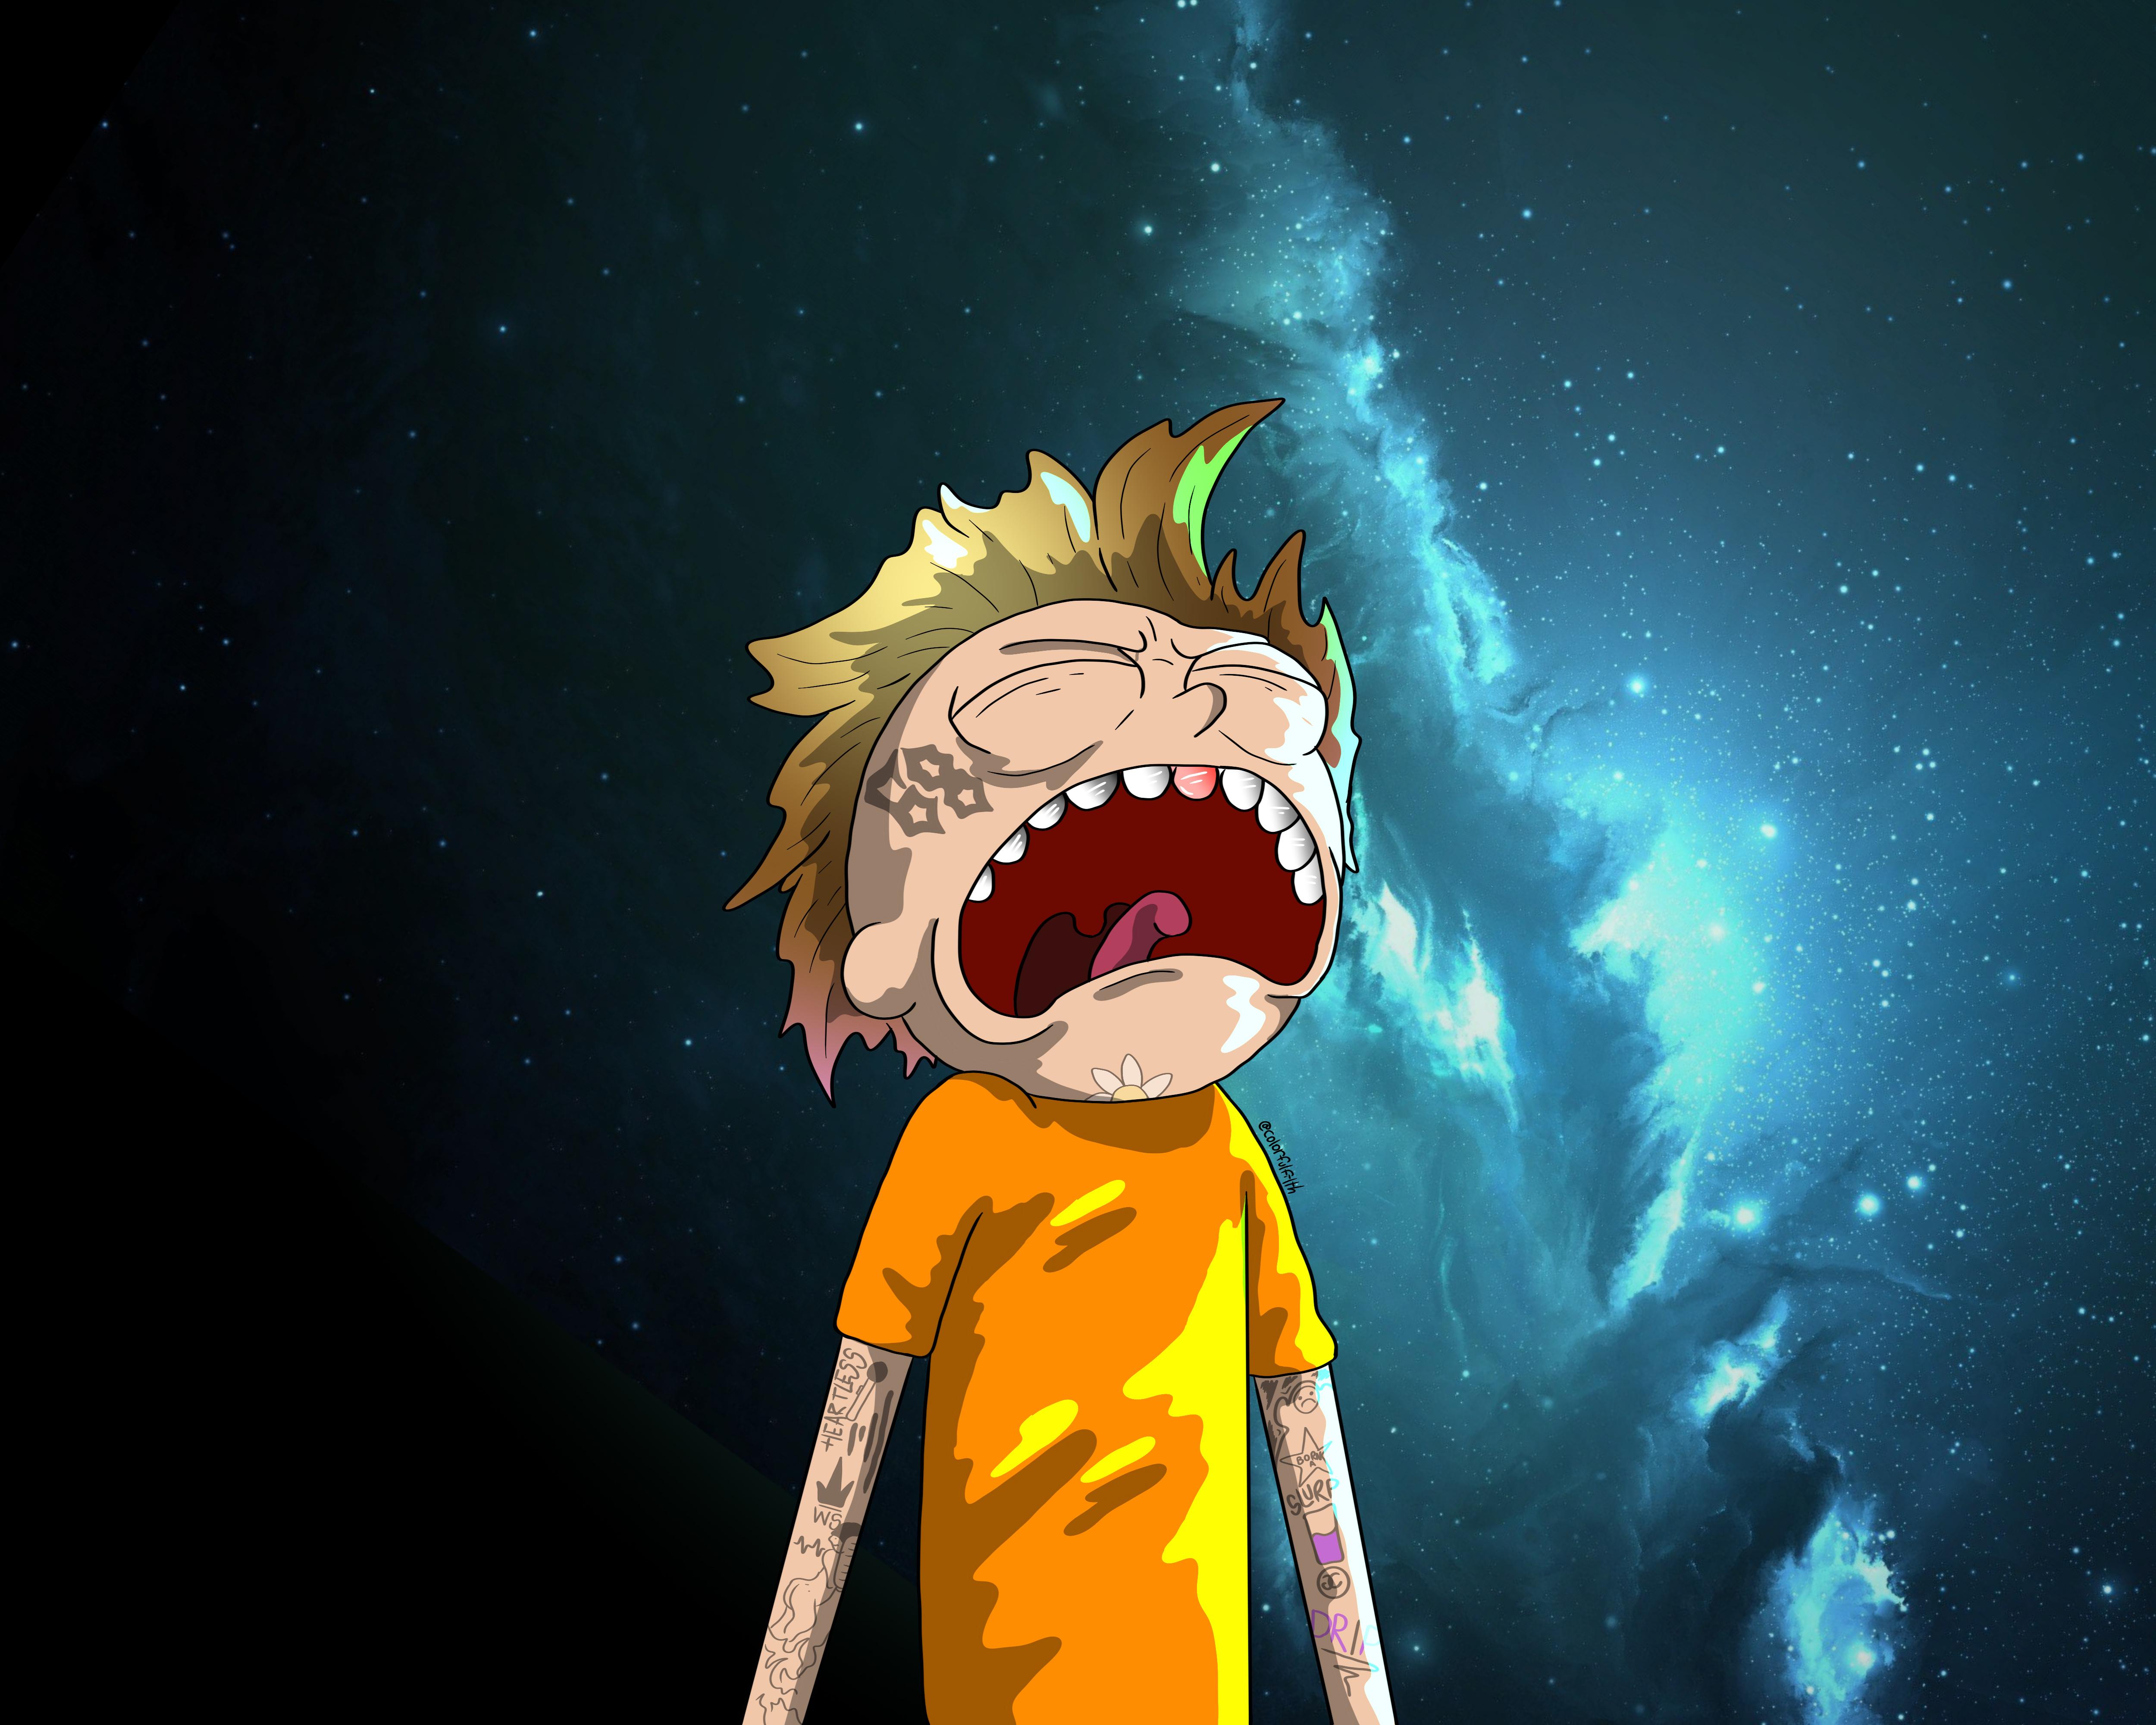 Crying Morty Digital Art, HD Cartoons, 4k Wallpapers ...